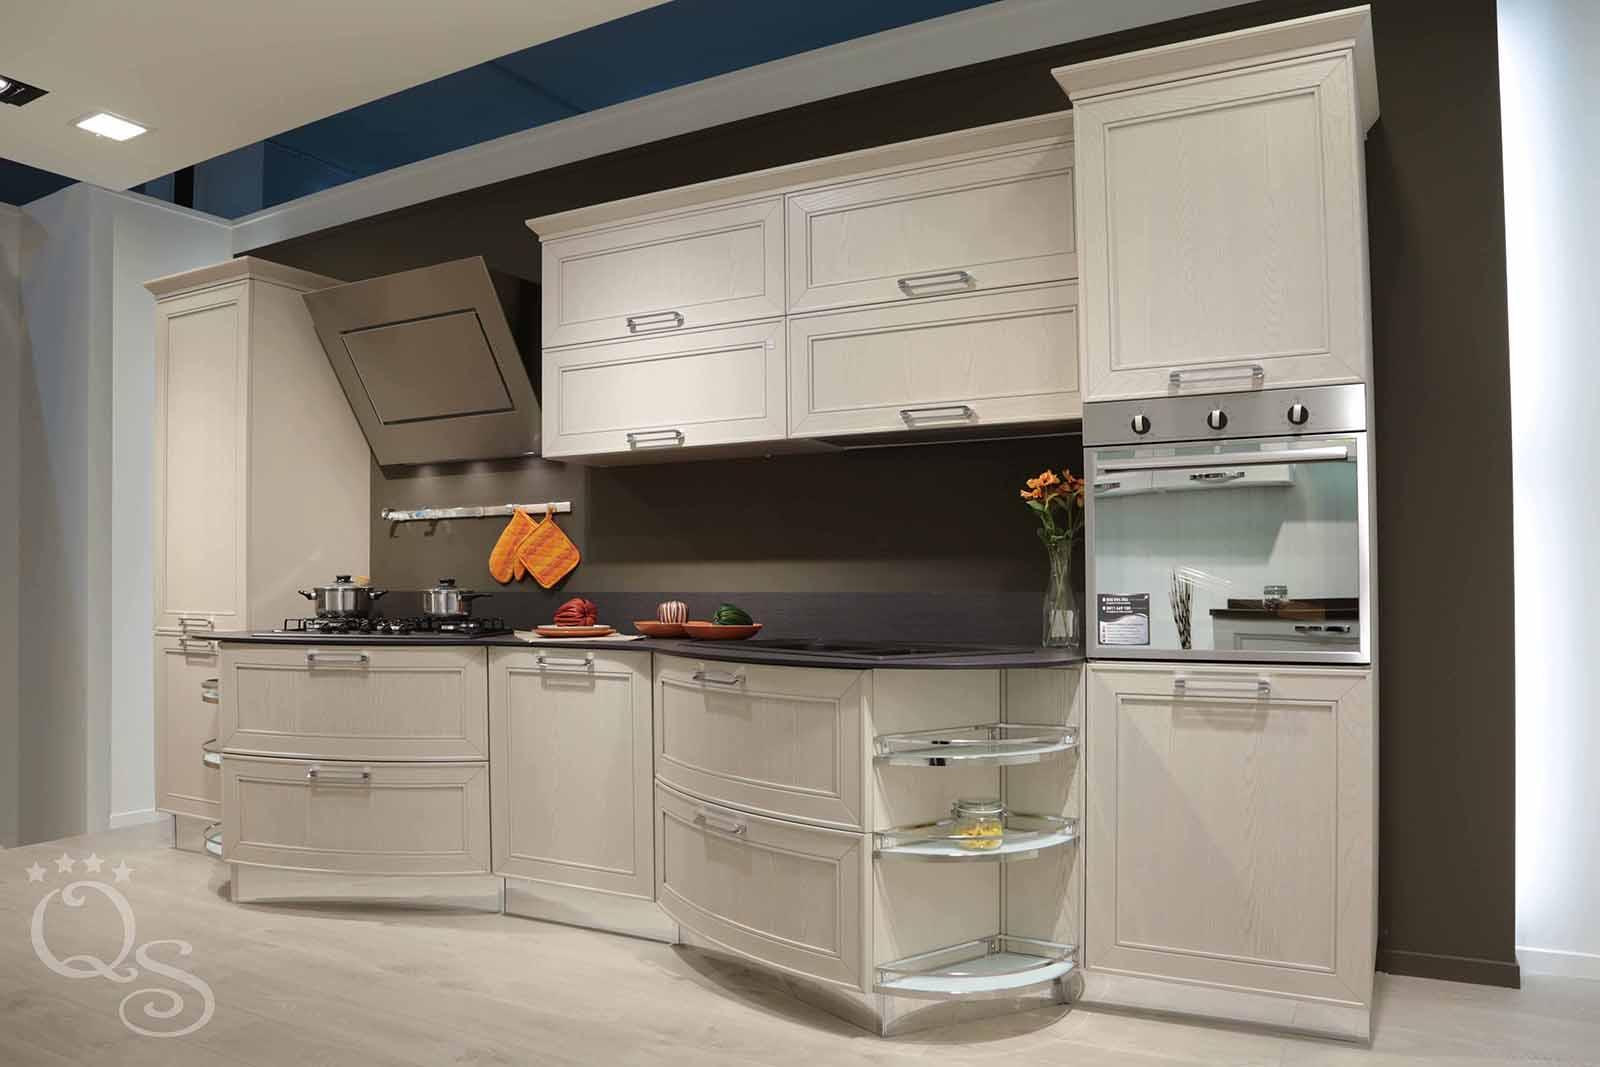 Cucine Magri Arreda. Cucine Nuovarredo Cucine Moderne Nuovarredo ...